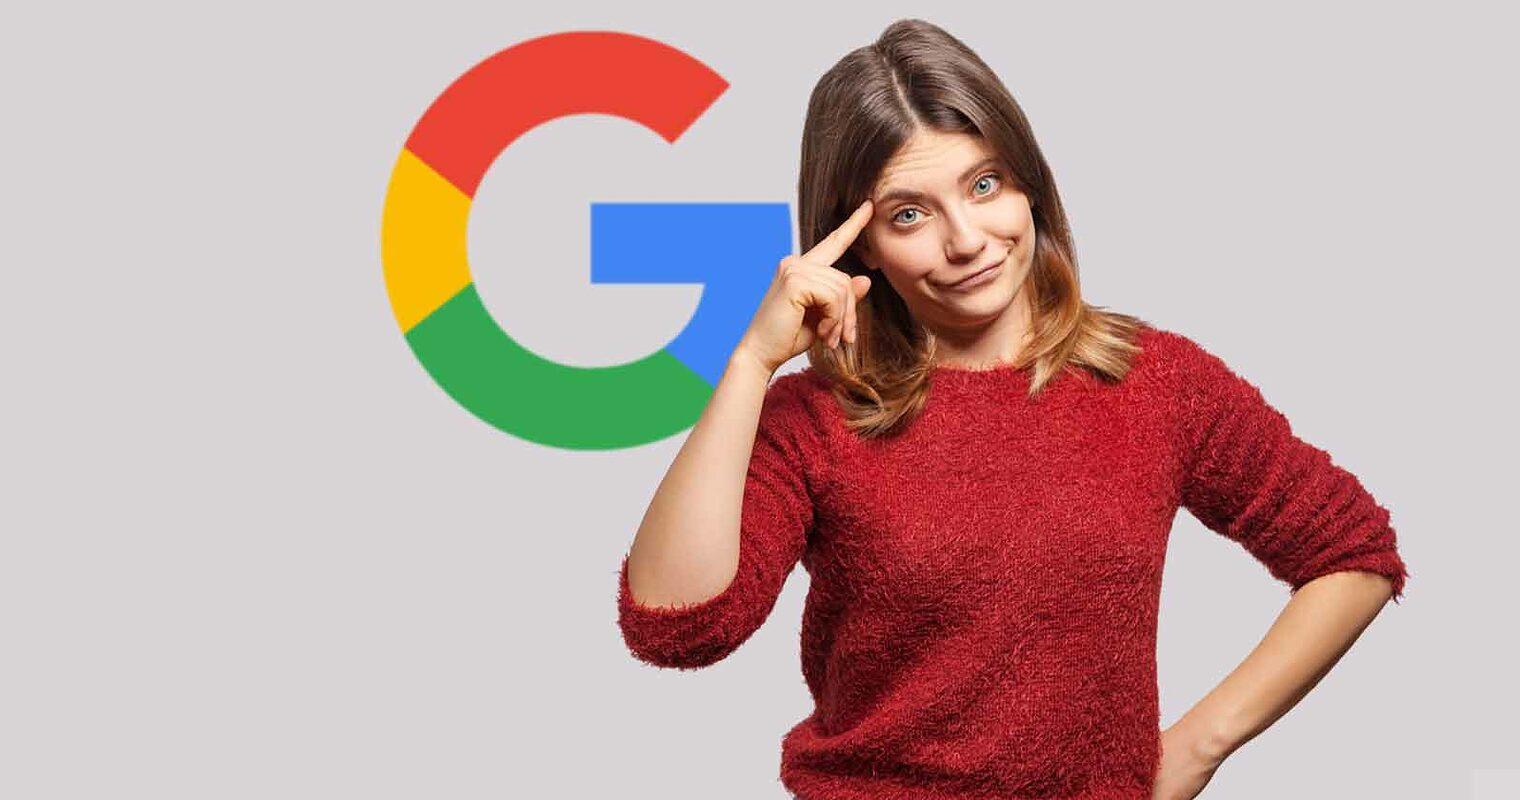 Google: Zero Click Claims Are Misleading